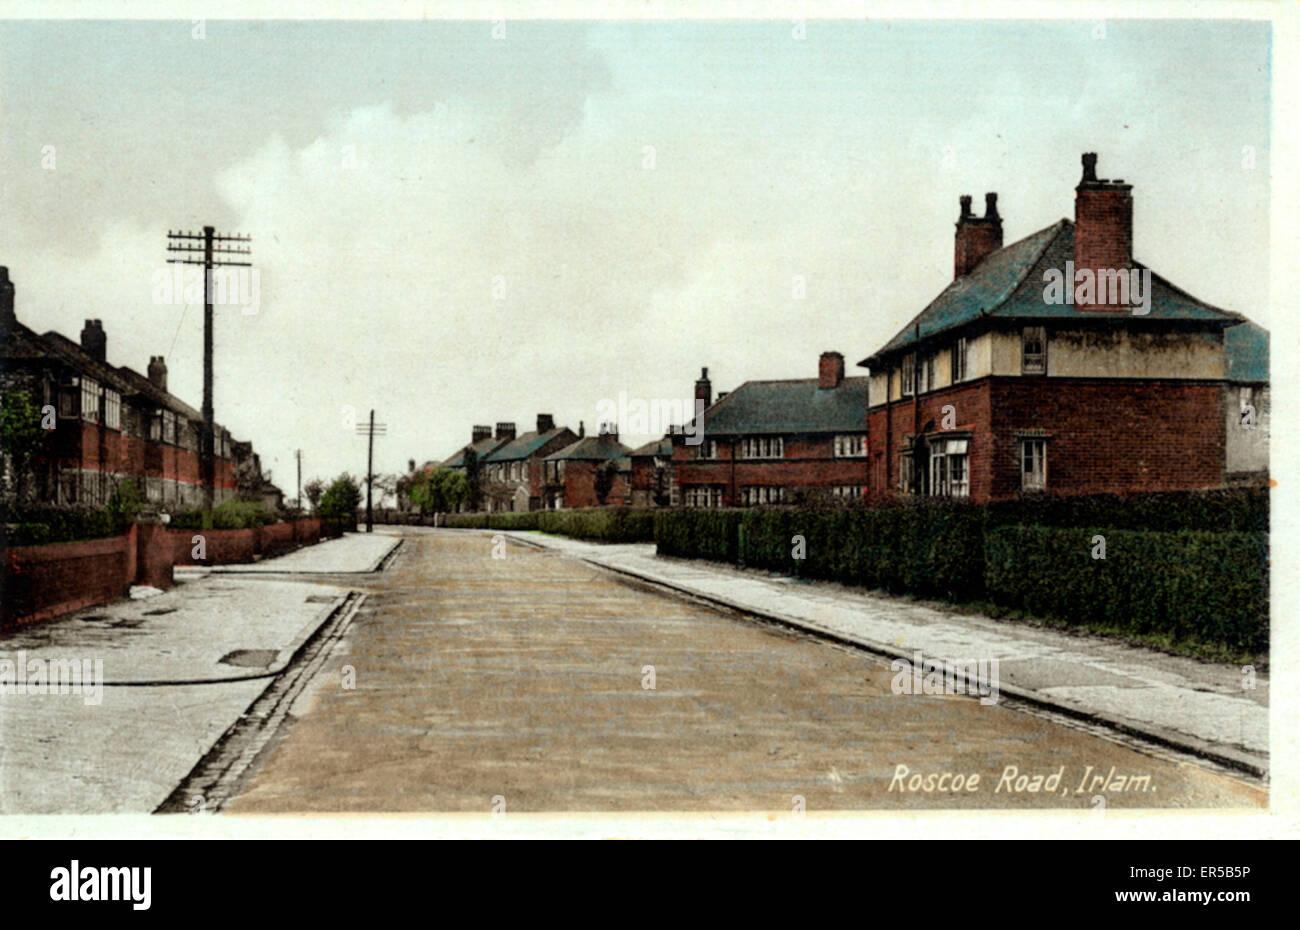 Roscoe Road, Irlam, Manchester, Lancashire, England.  1920s - Stock Image